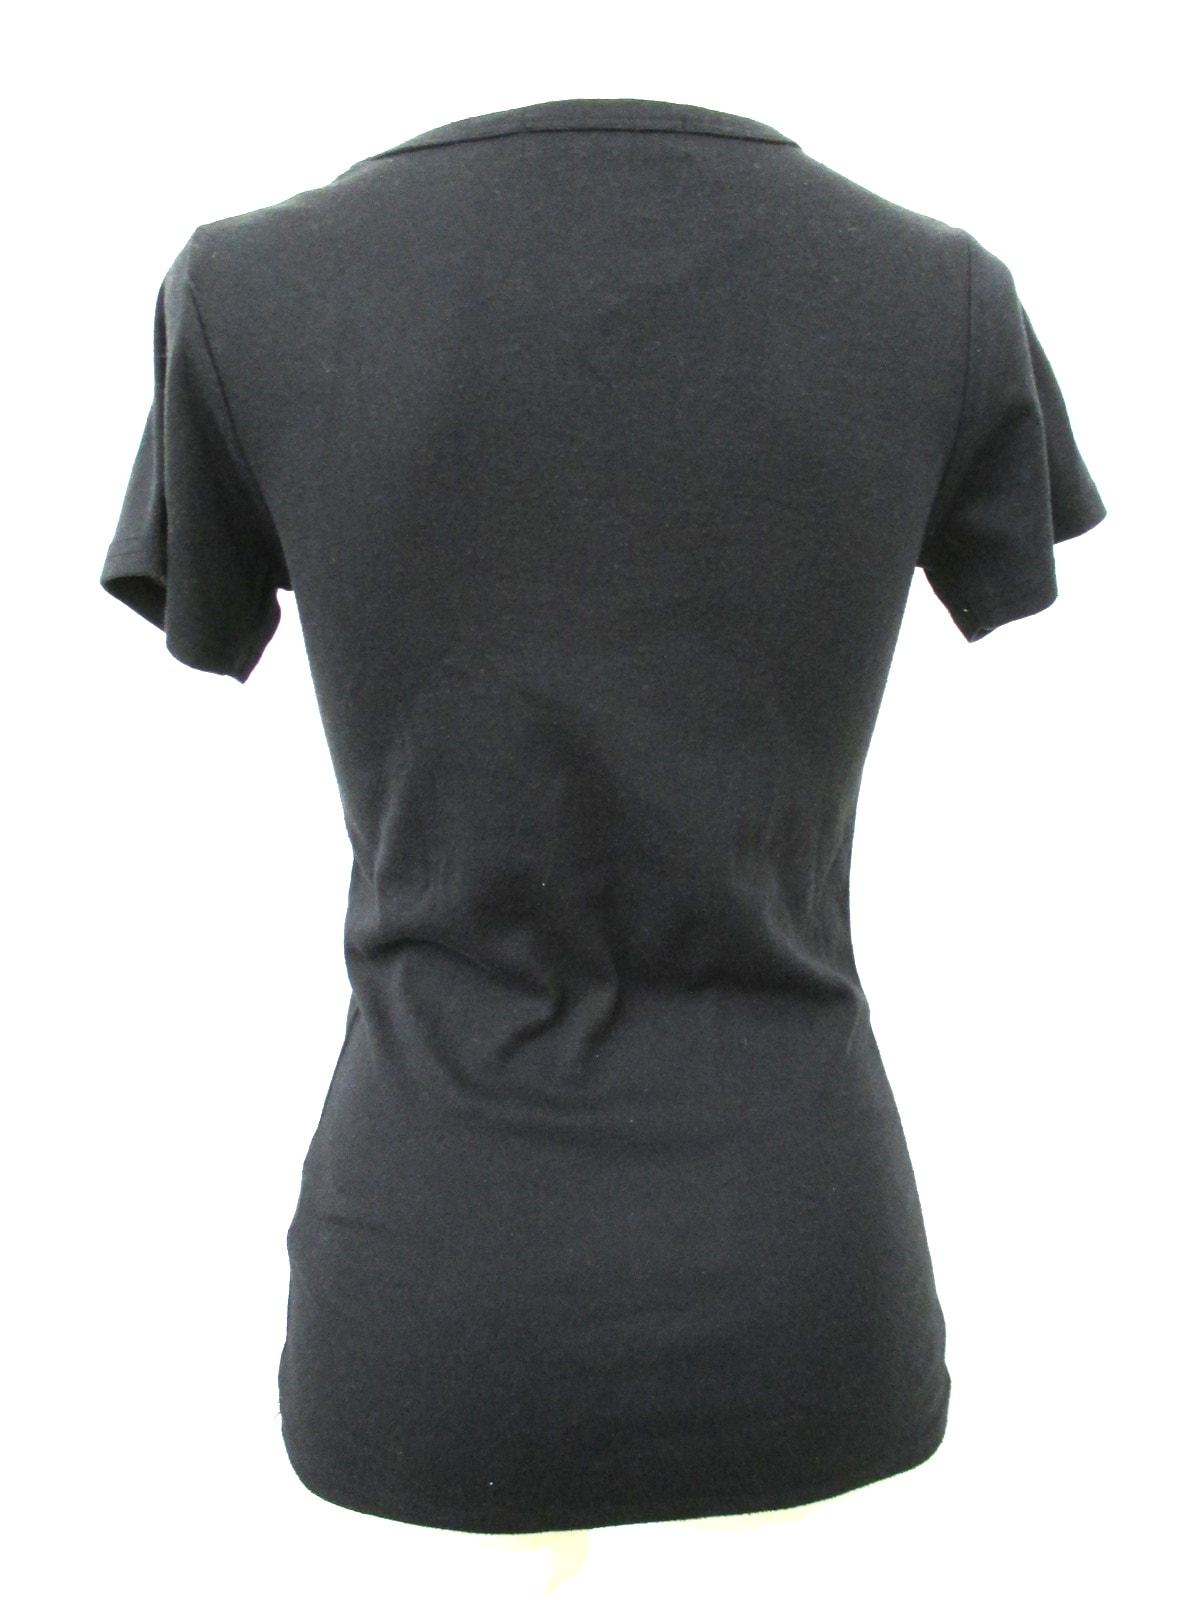 Marvelous(マーベラス)のTシャツ